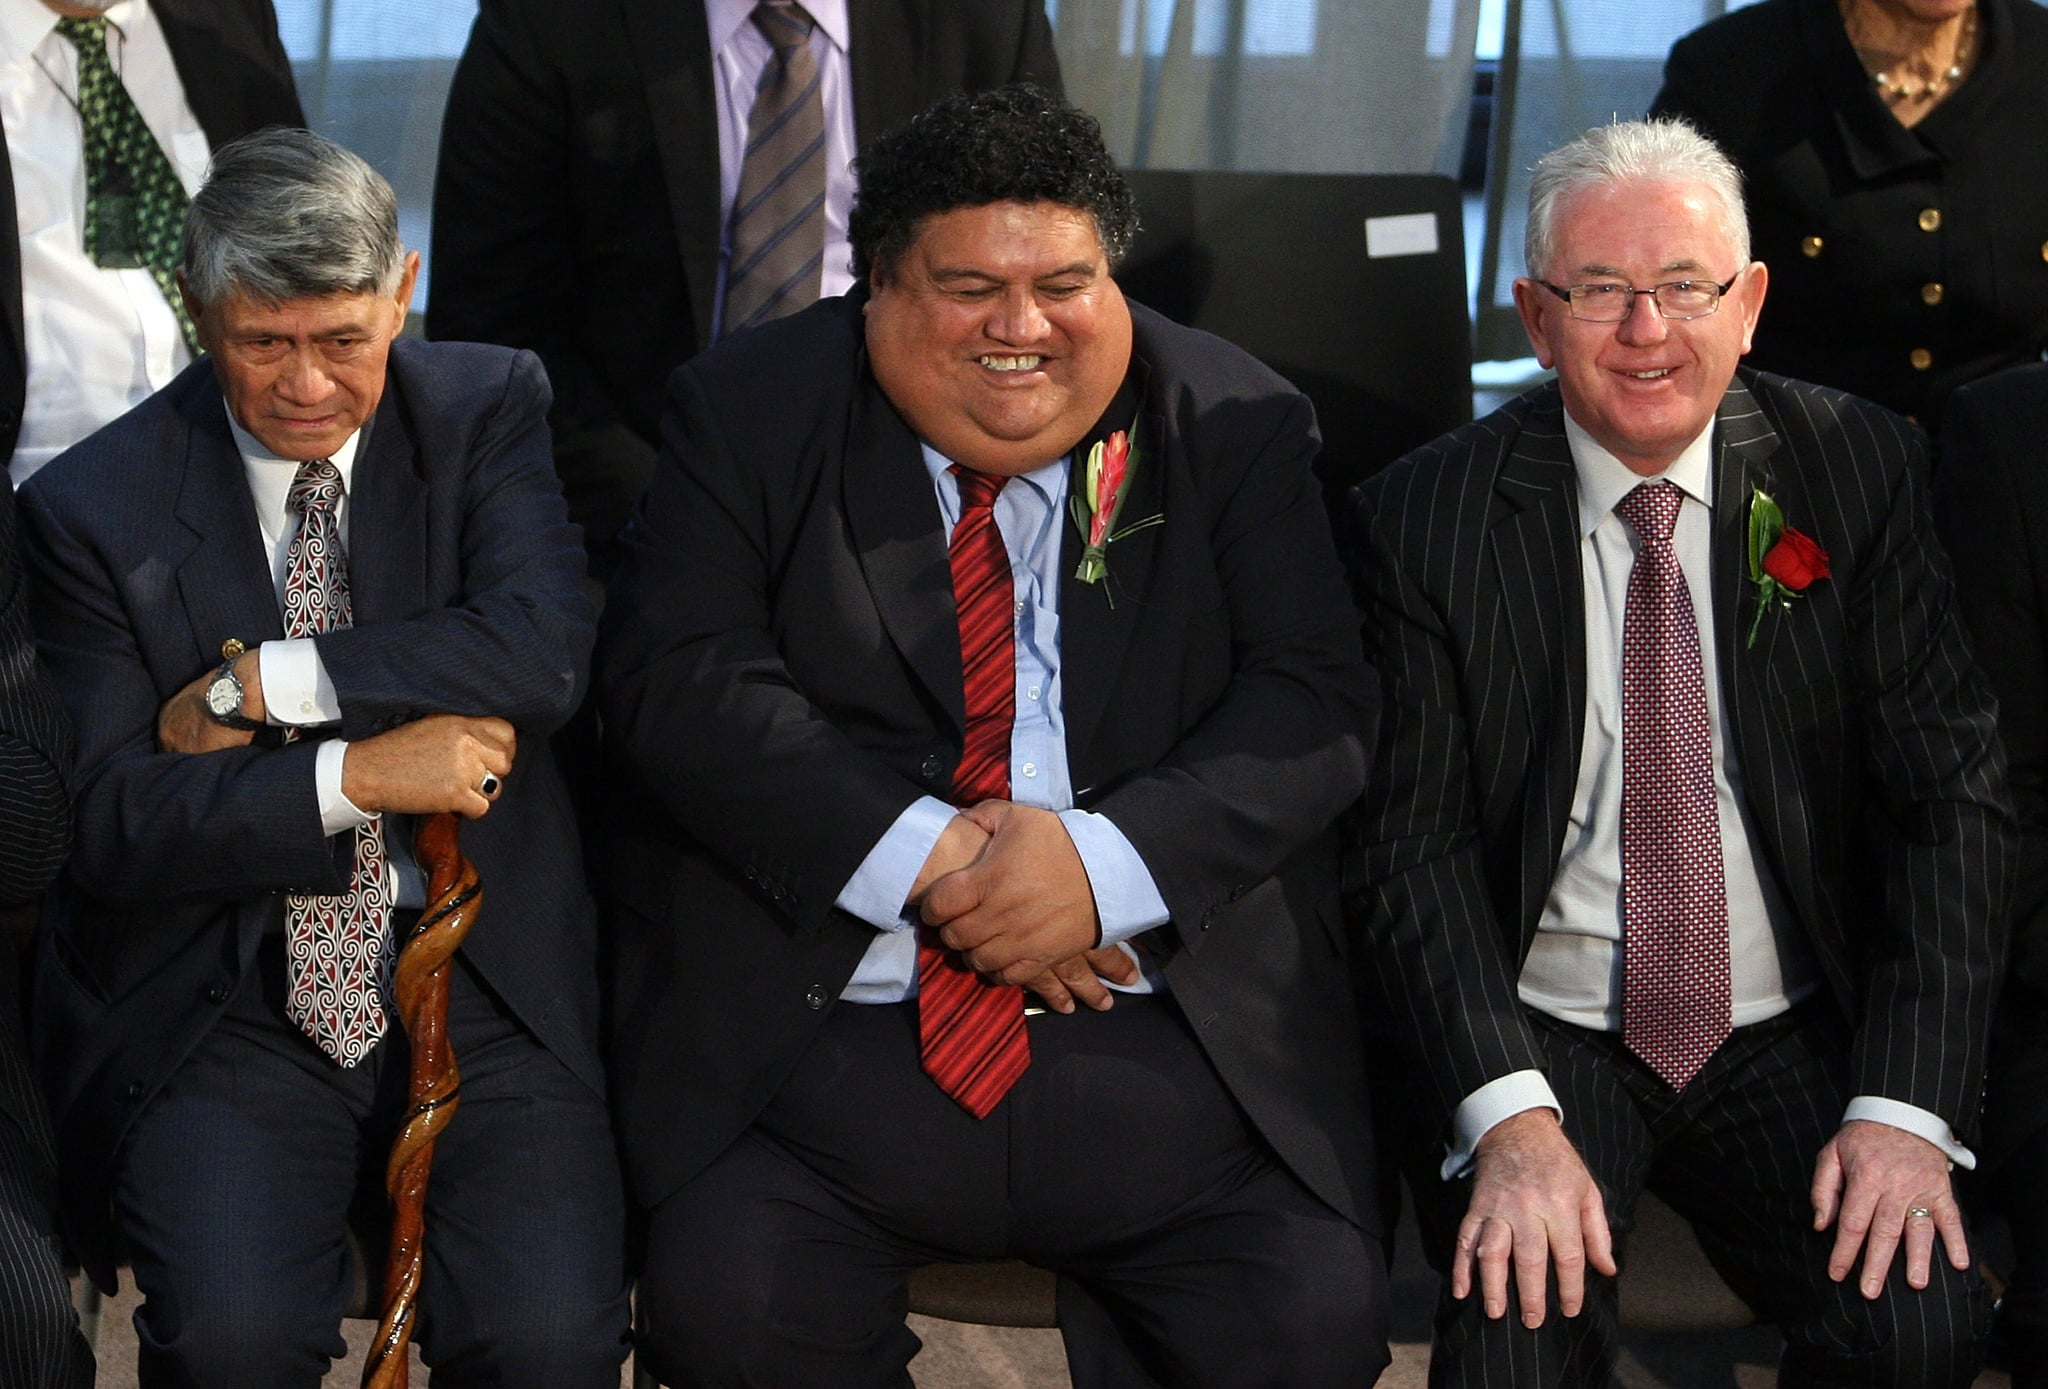 Maori officials wait to sign the historic treaty.